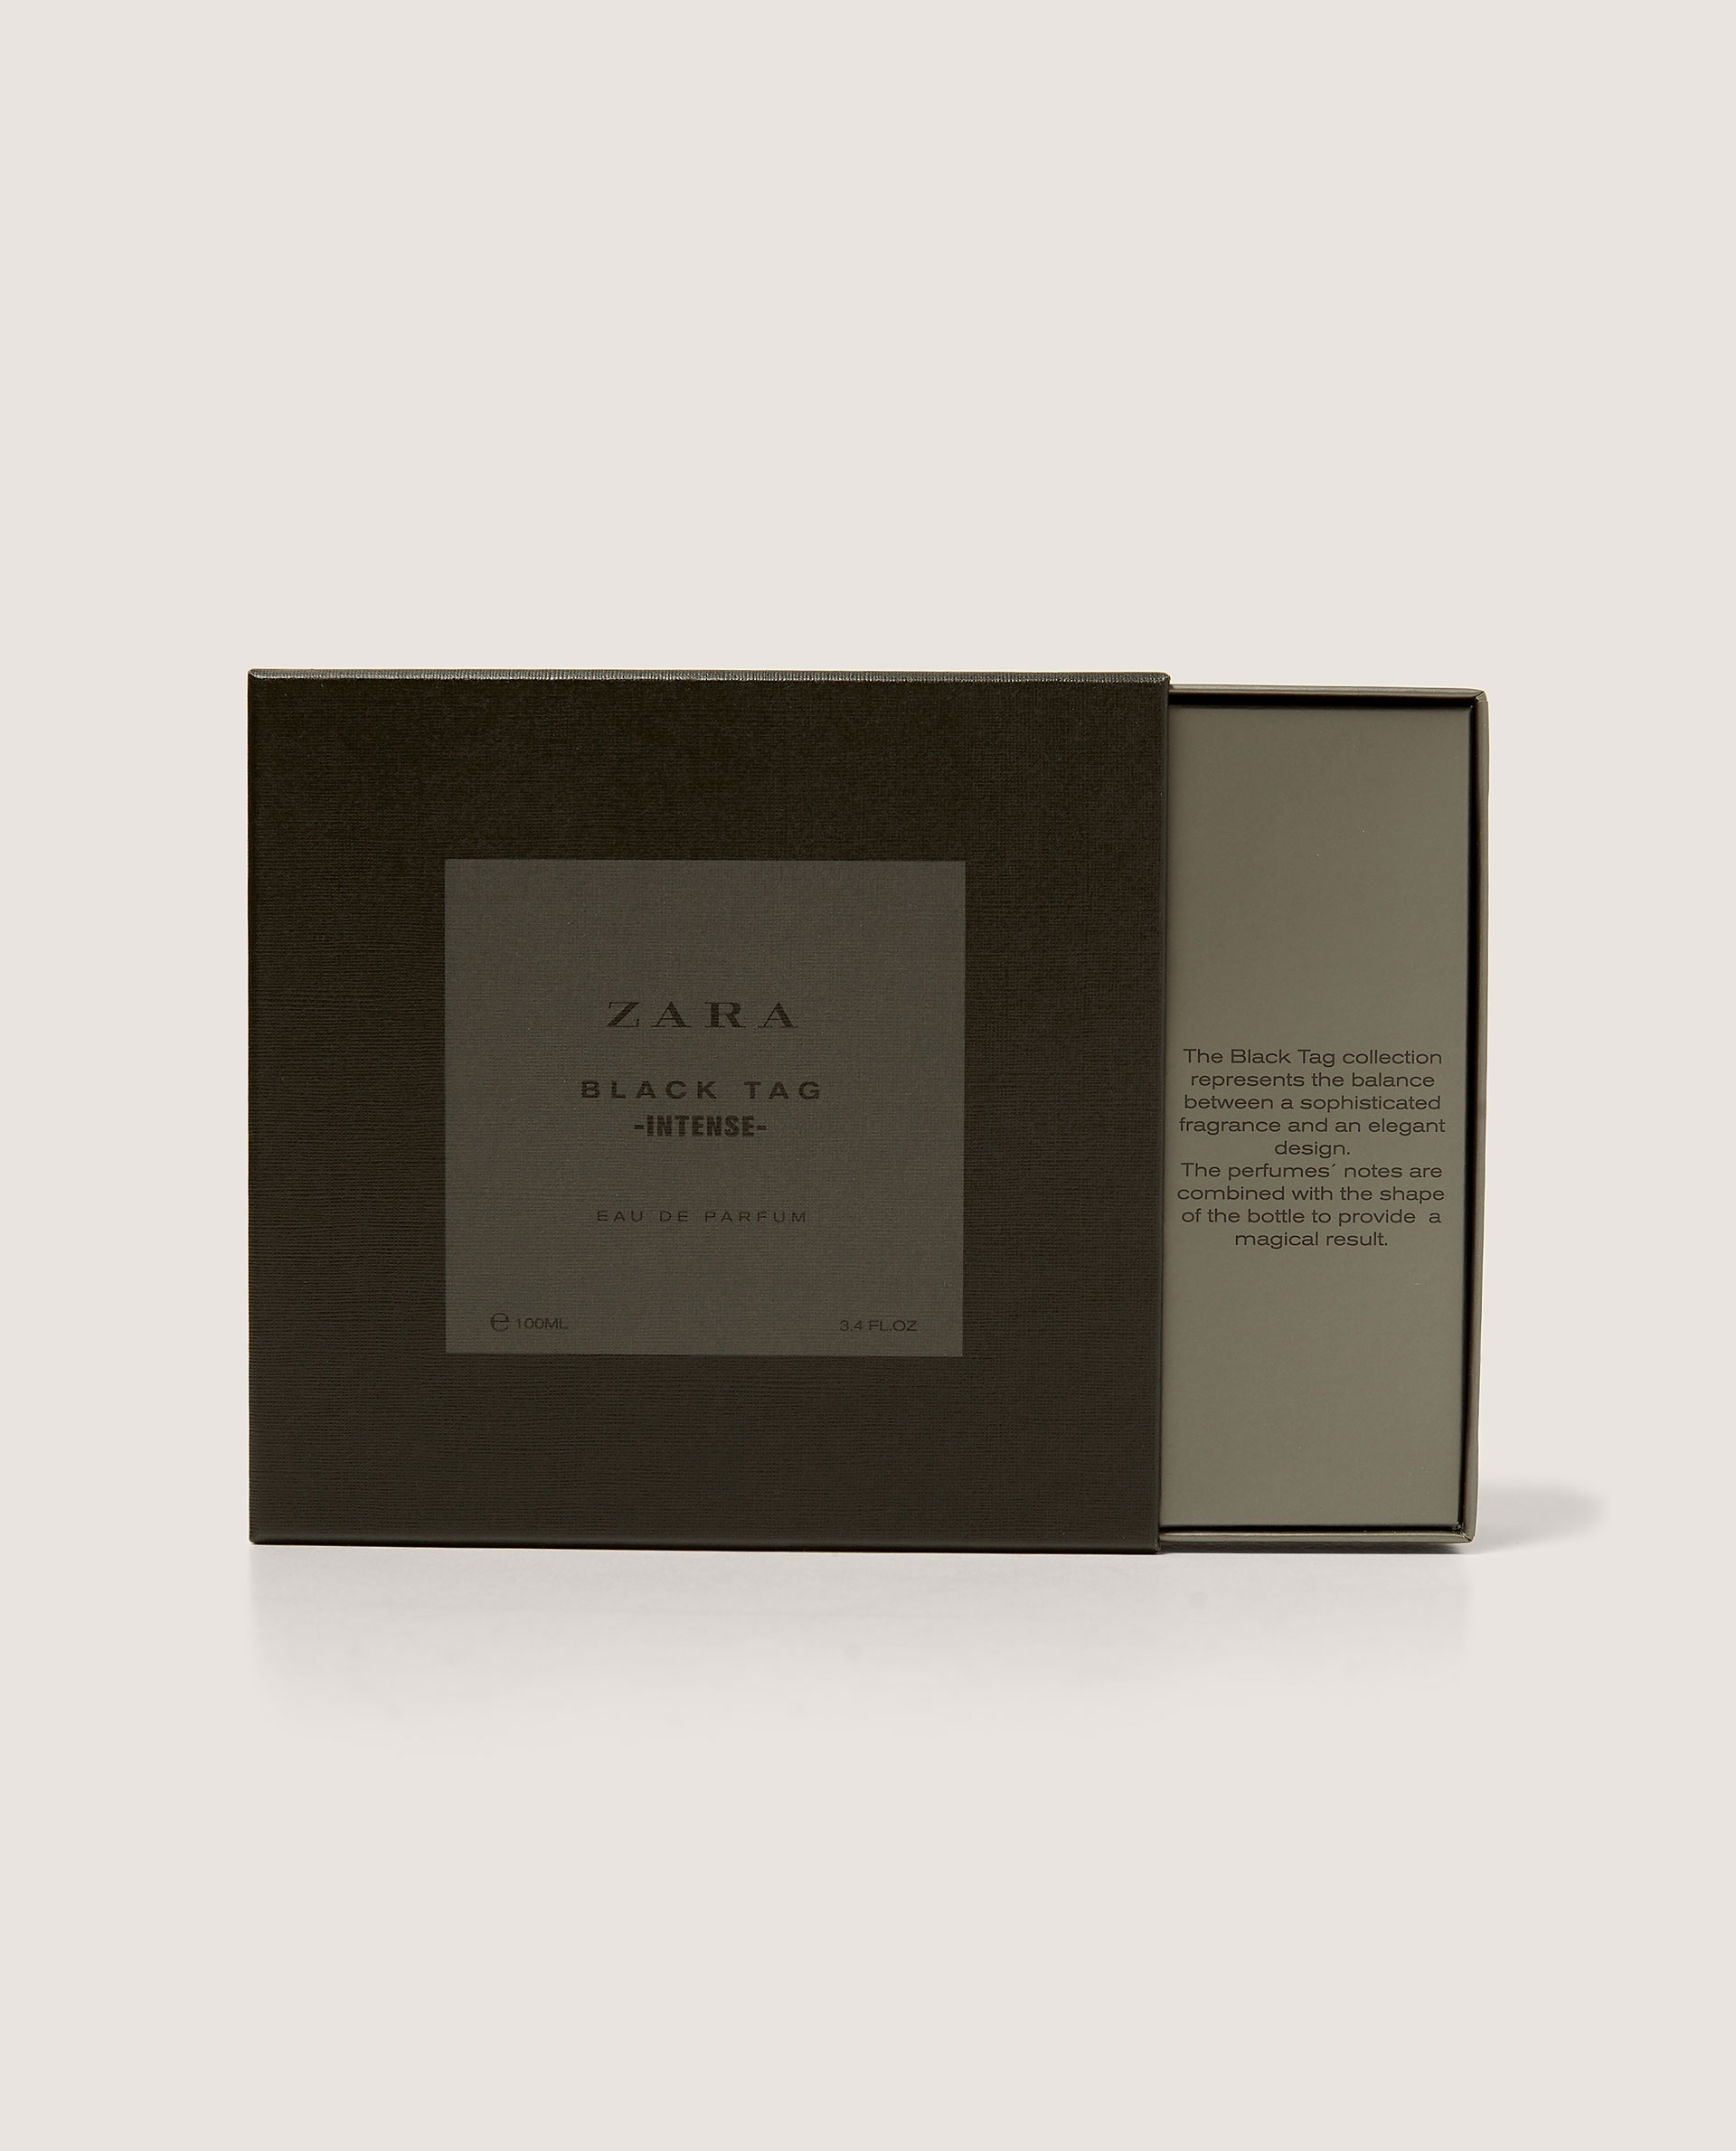 Zara Black Tag Intense Eau De Parfum 2017 Zara одеколон новый